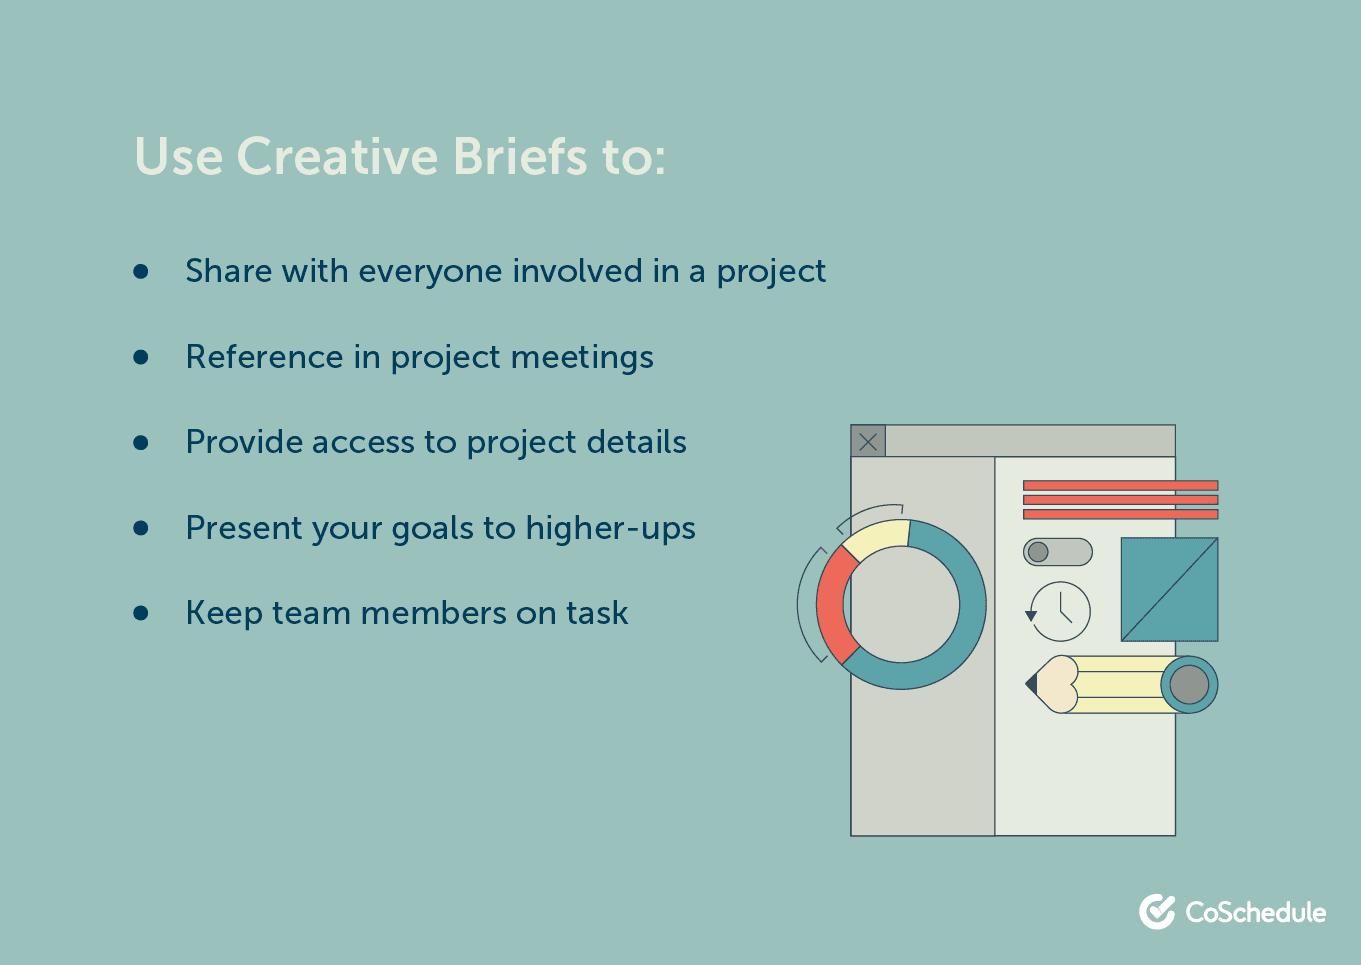 Outcomes of using a creative brief